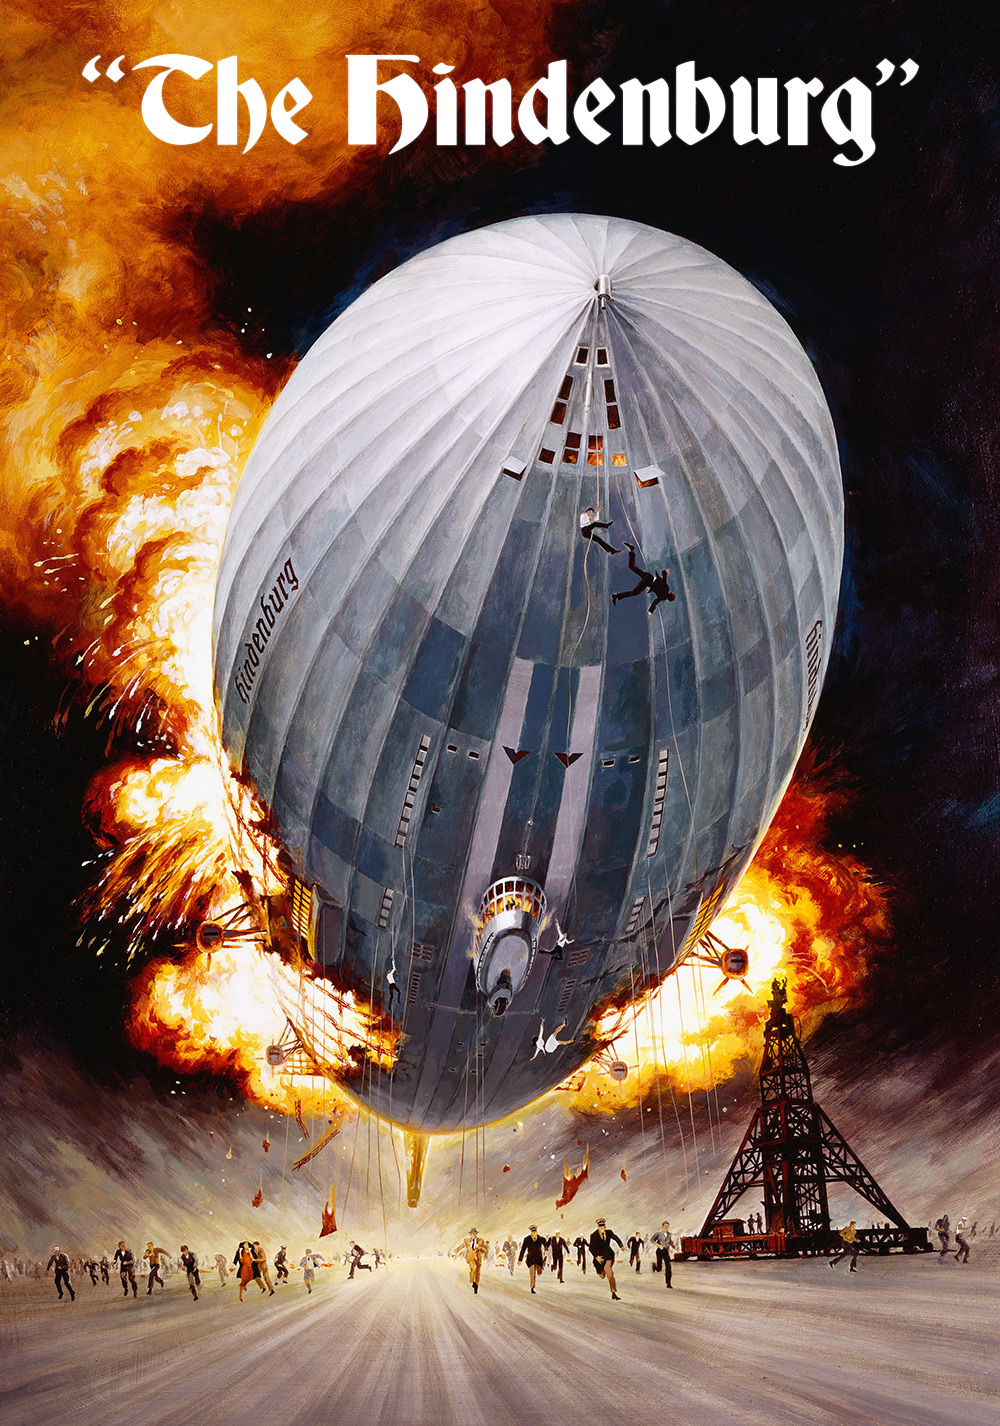 Film Hindenburg